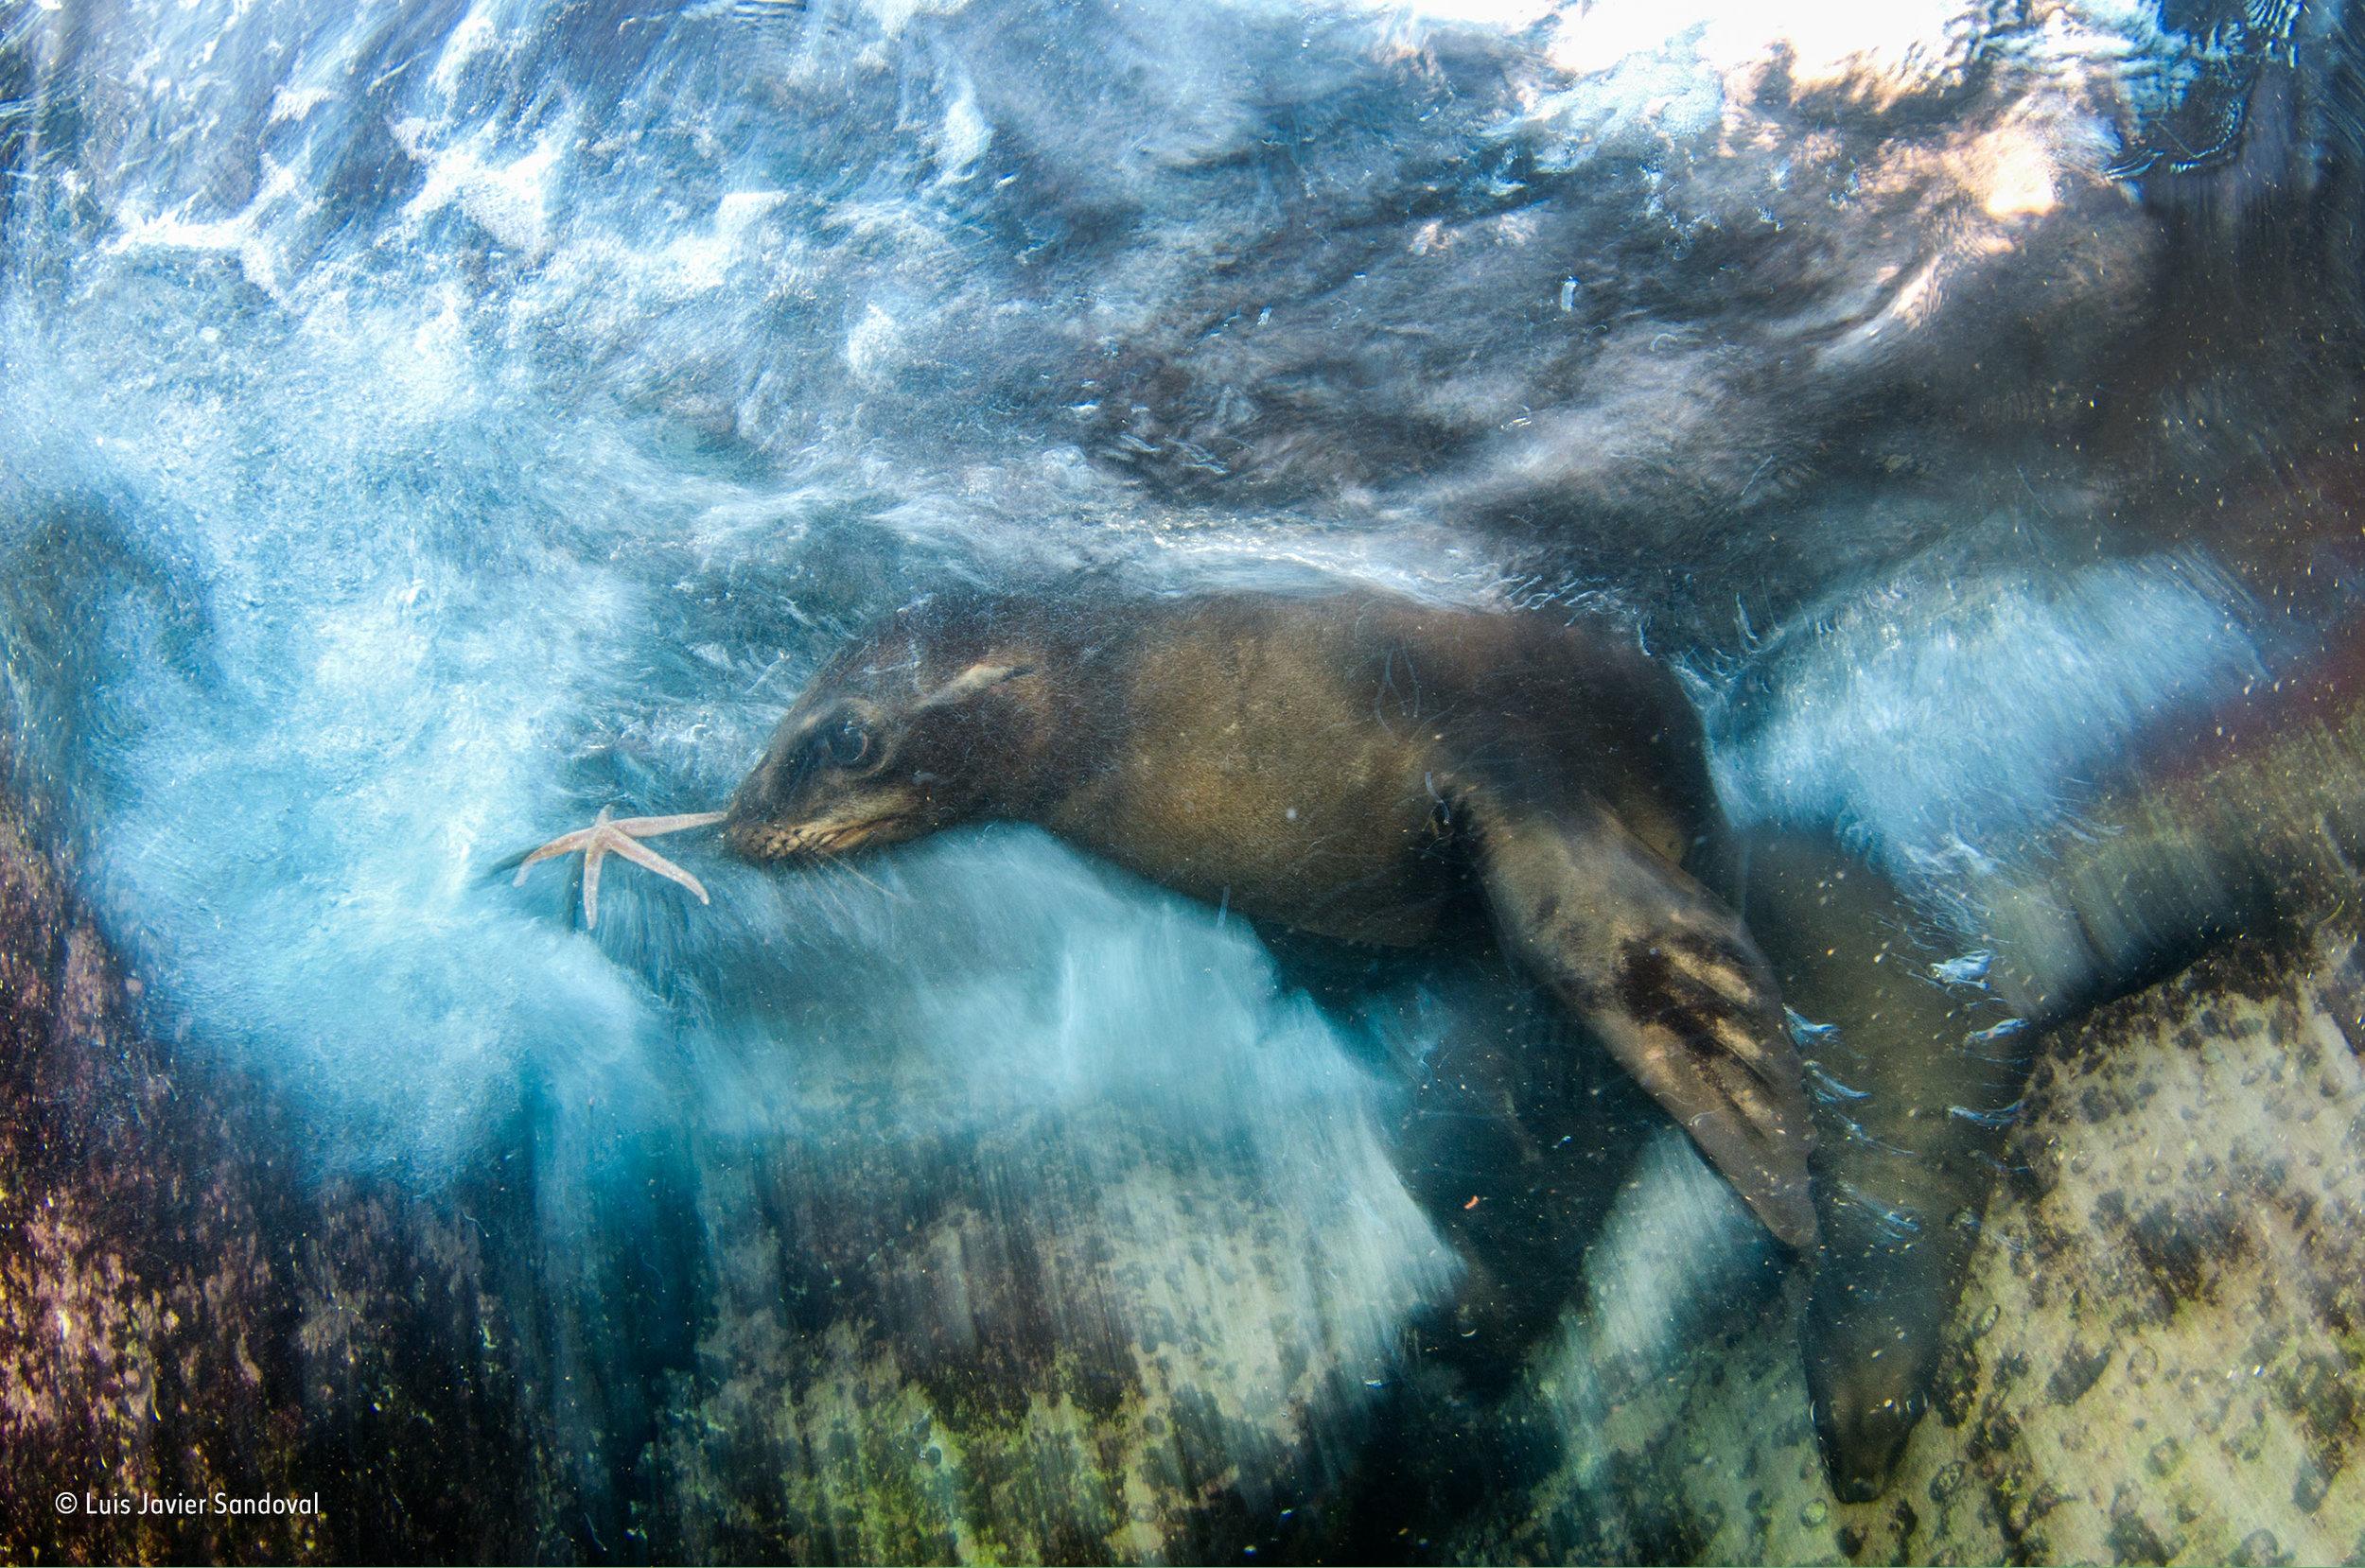 © Luis Javier Sandoval_Wildlife Photographer of the Year_ Impressions winner